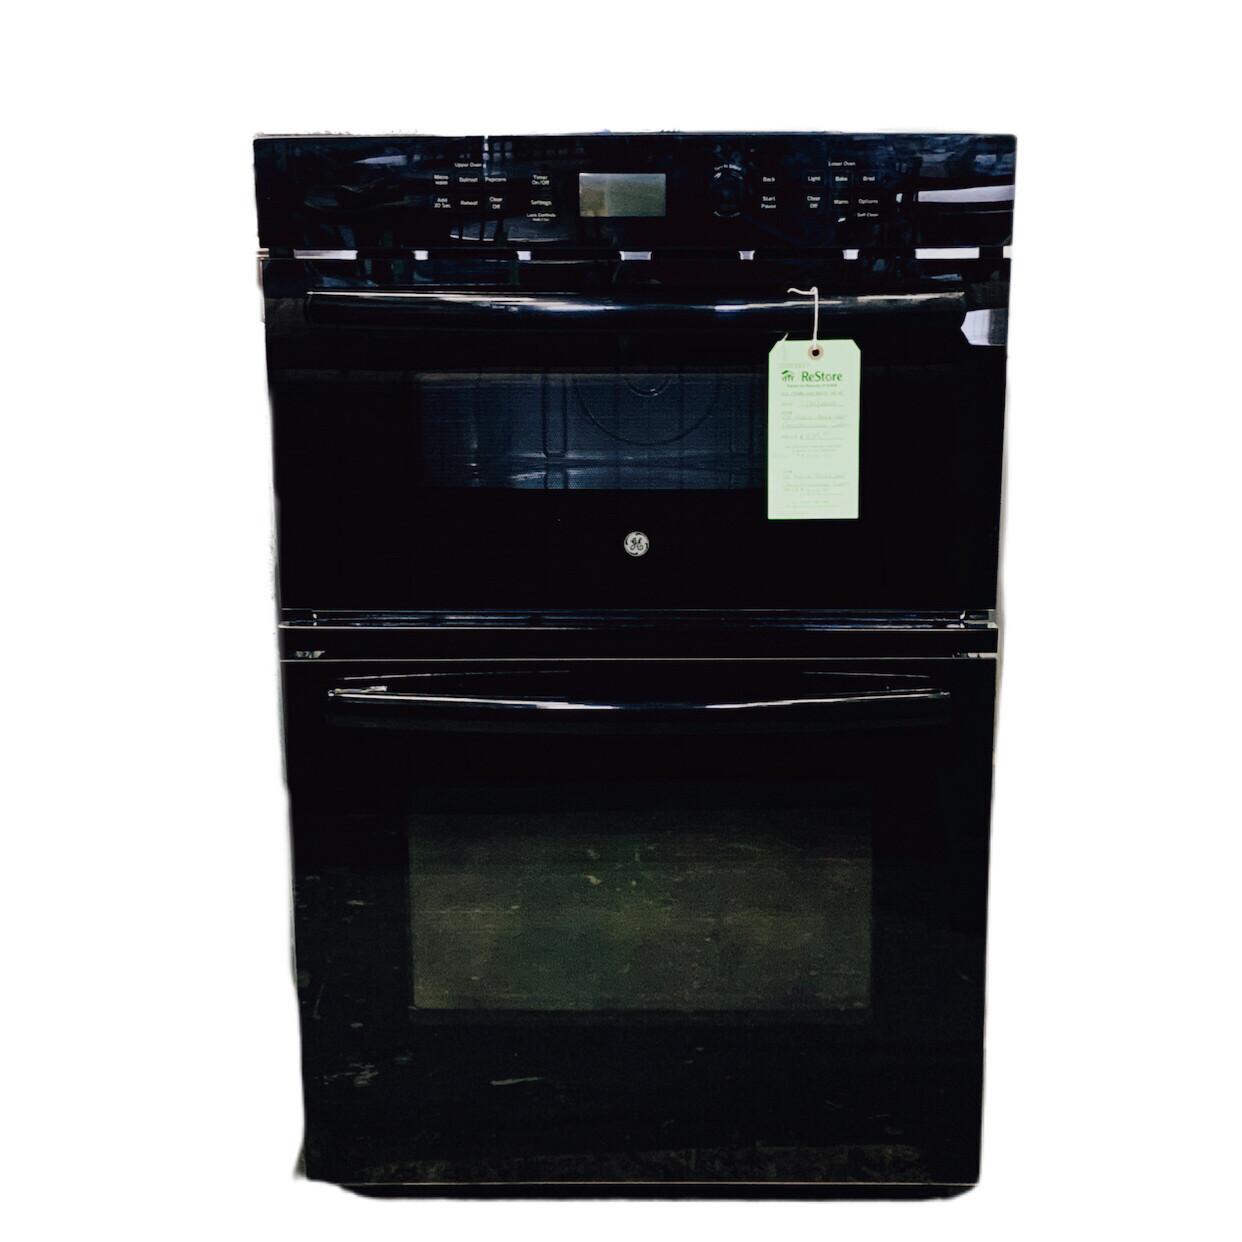 GE Profile Black Wall Oven Microwave Combo